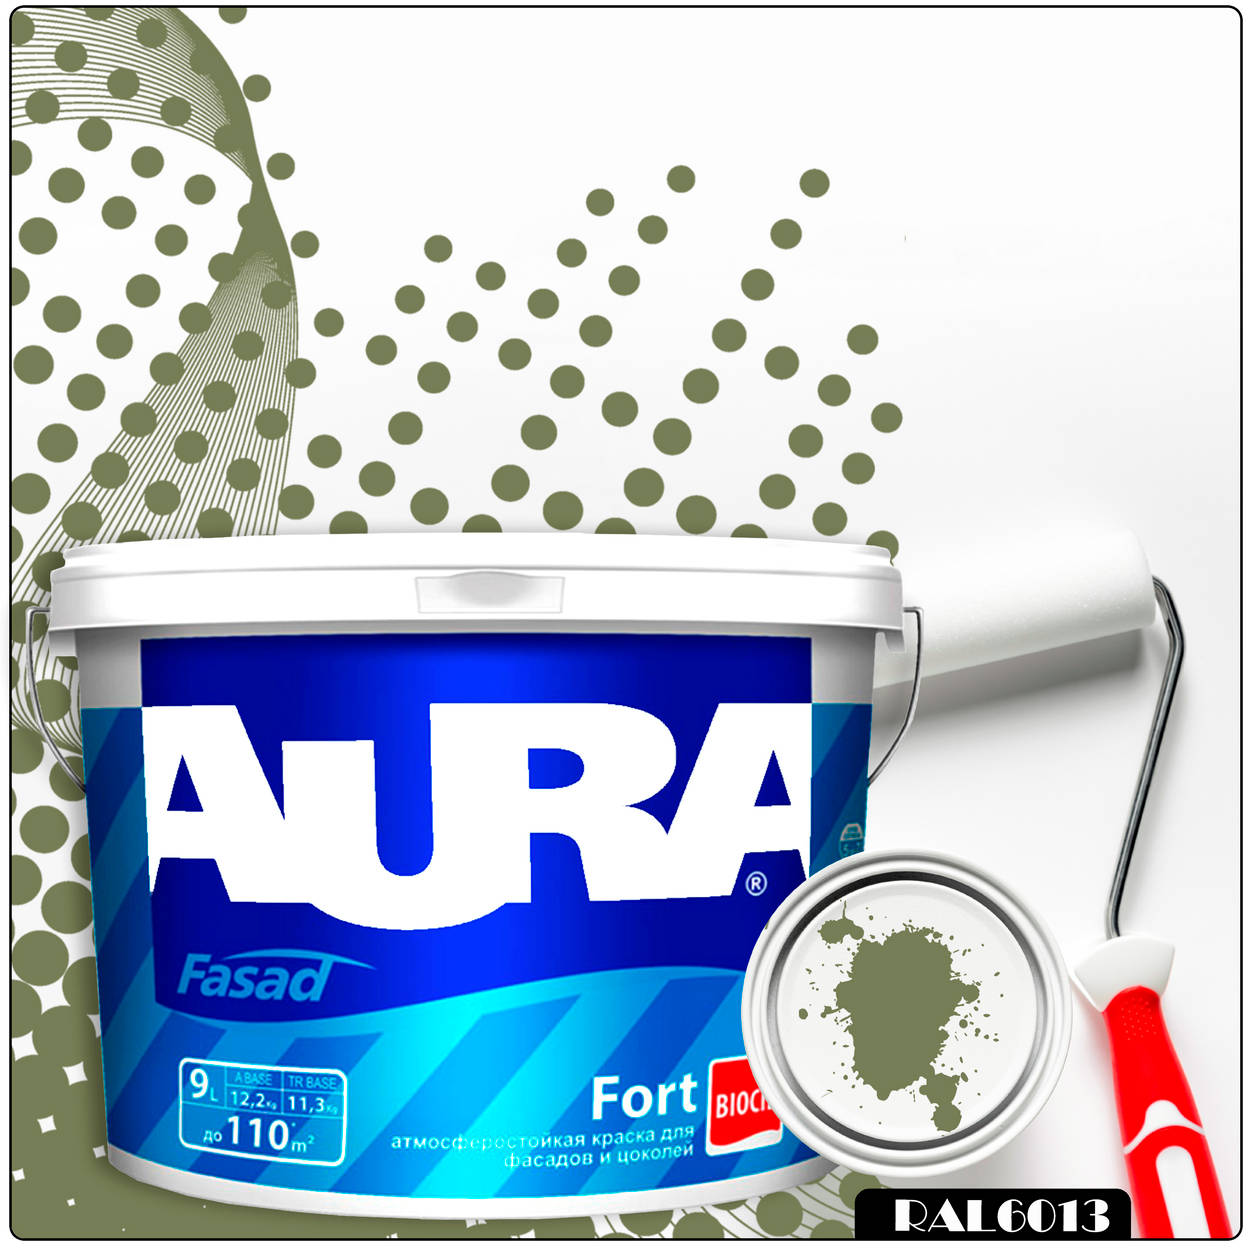 Фото 14 - Краска Aura Fasad Fort, RAL 6013 Зеленый тростник, латексная, матовая, для фасада и цоколей, 9л, Аура.